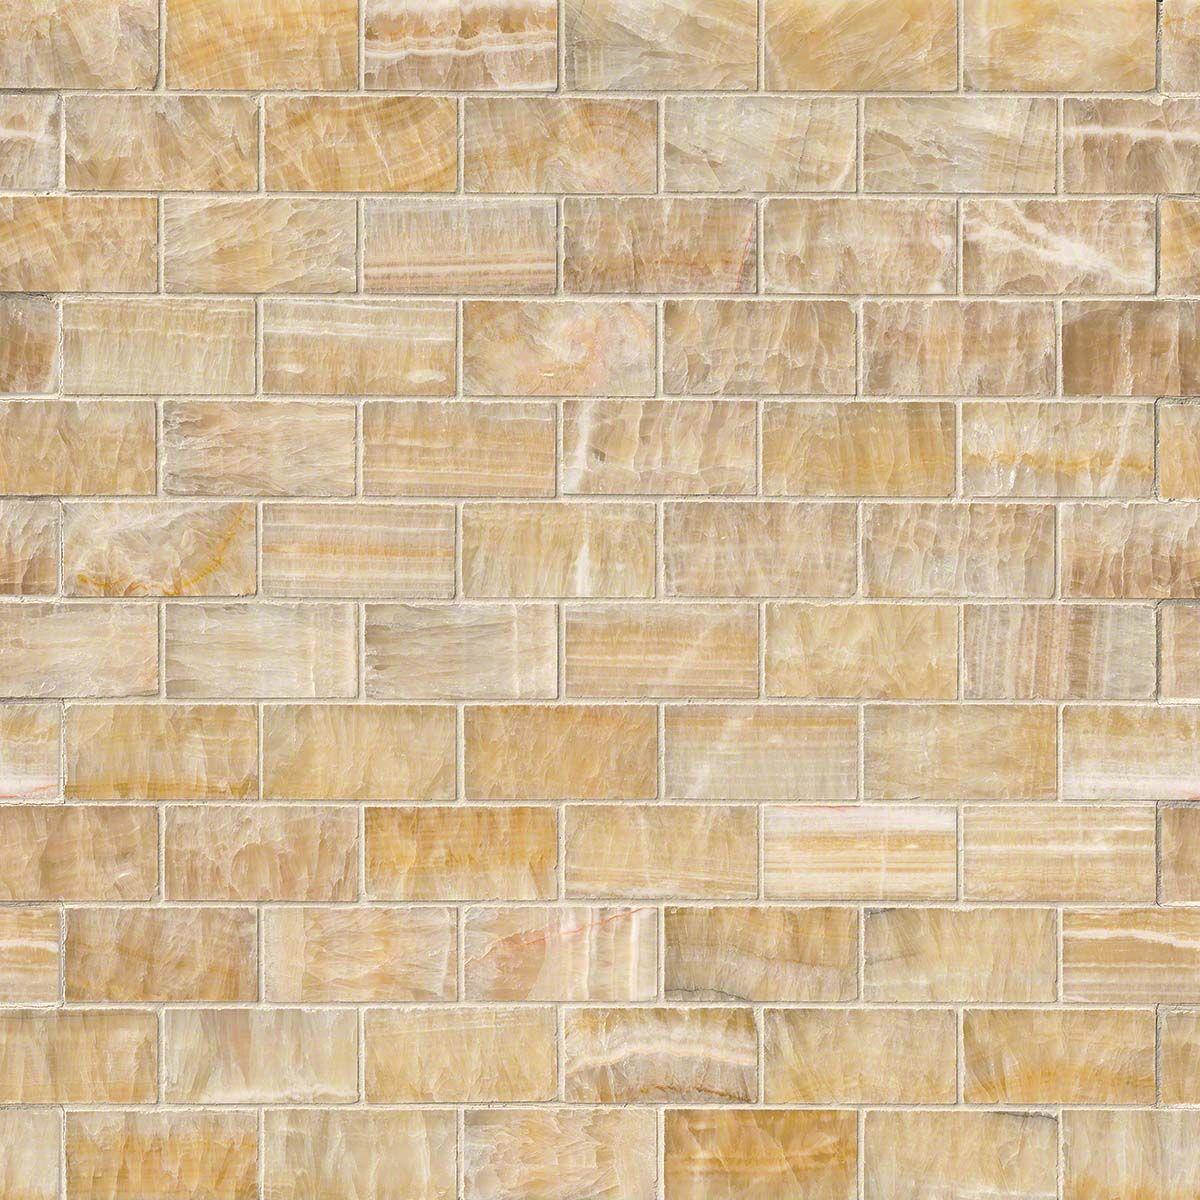 Honey Onyx 2x4x8mm Subway Tile In 12x12 Mesh 2017 Likes